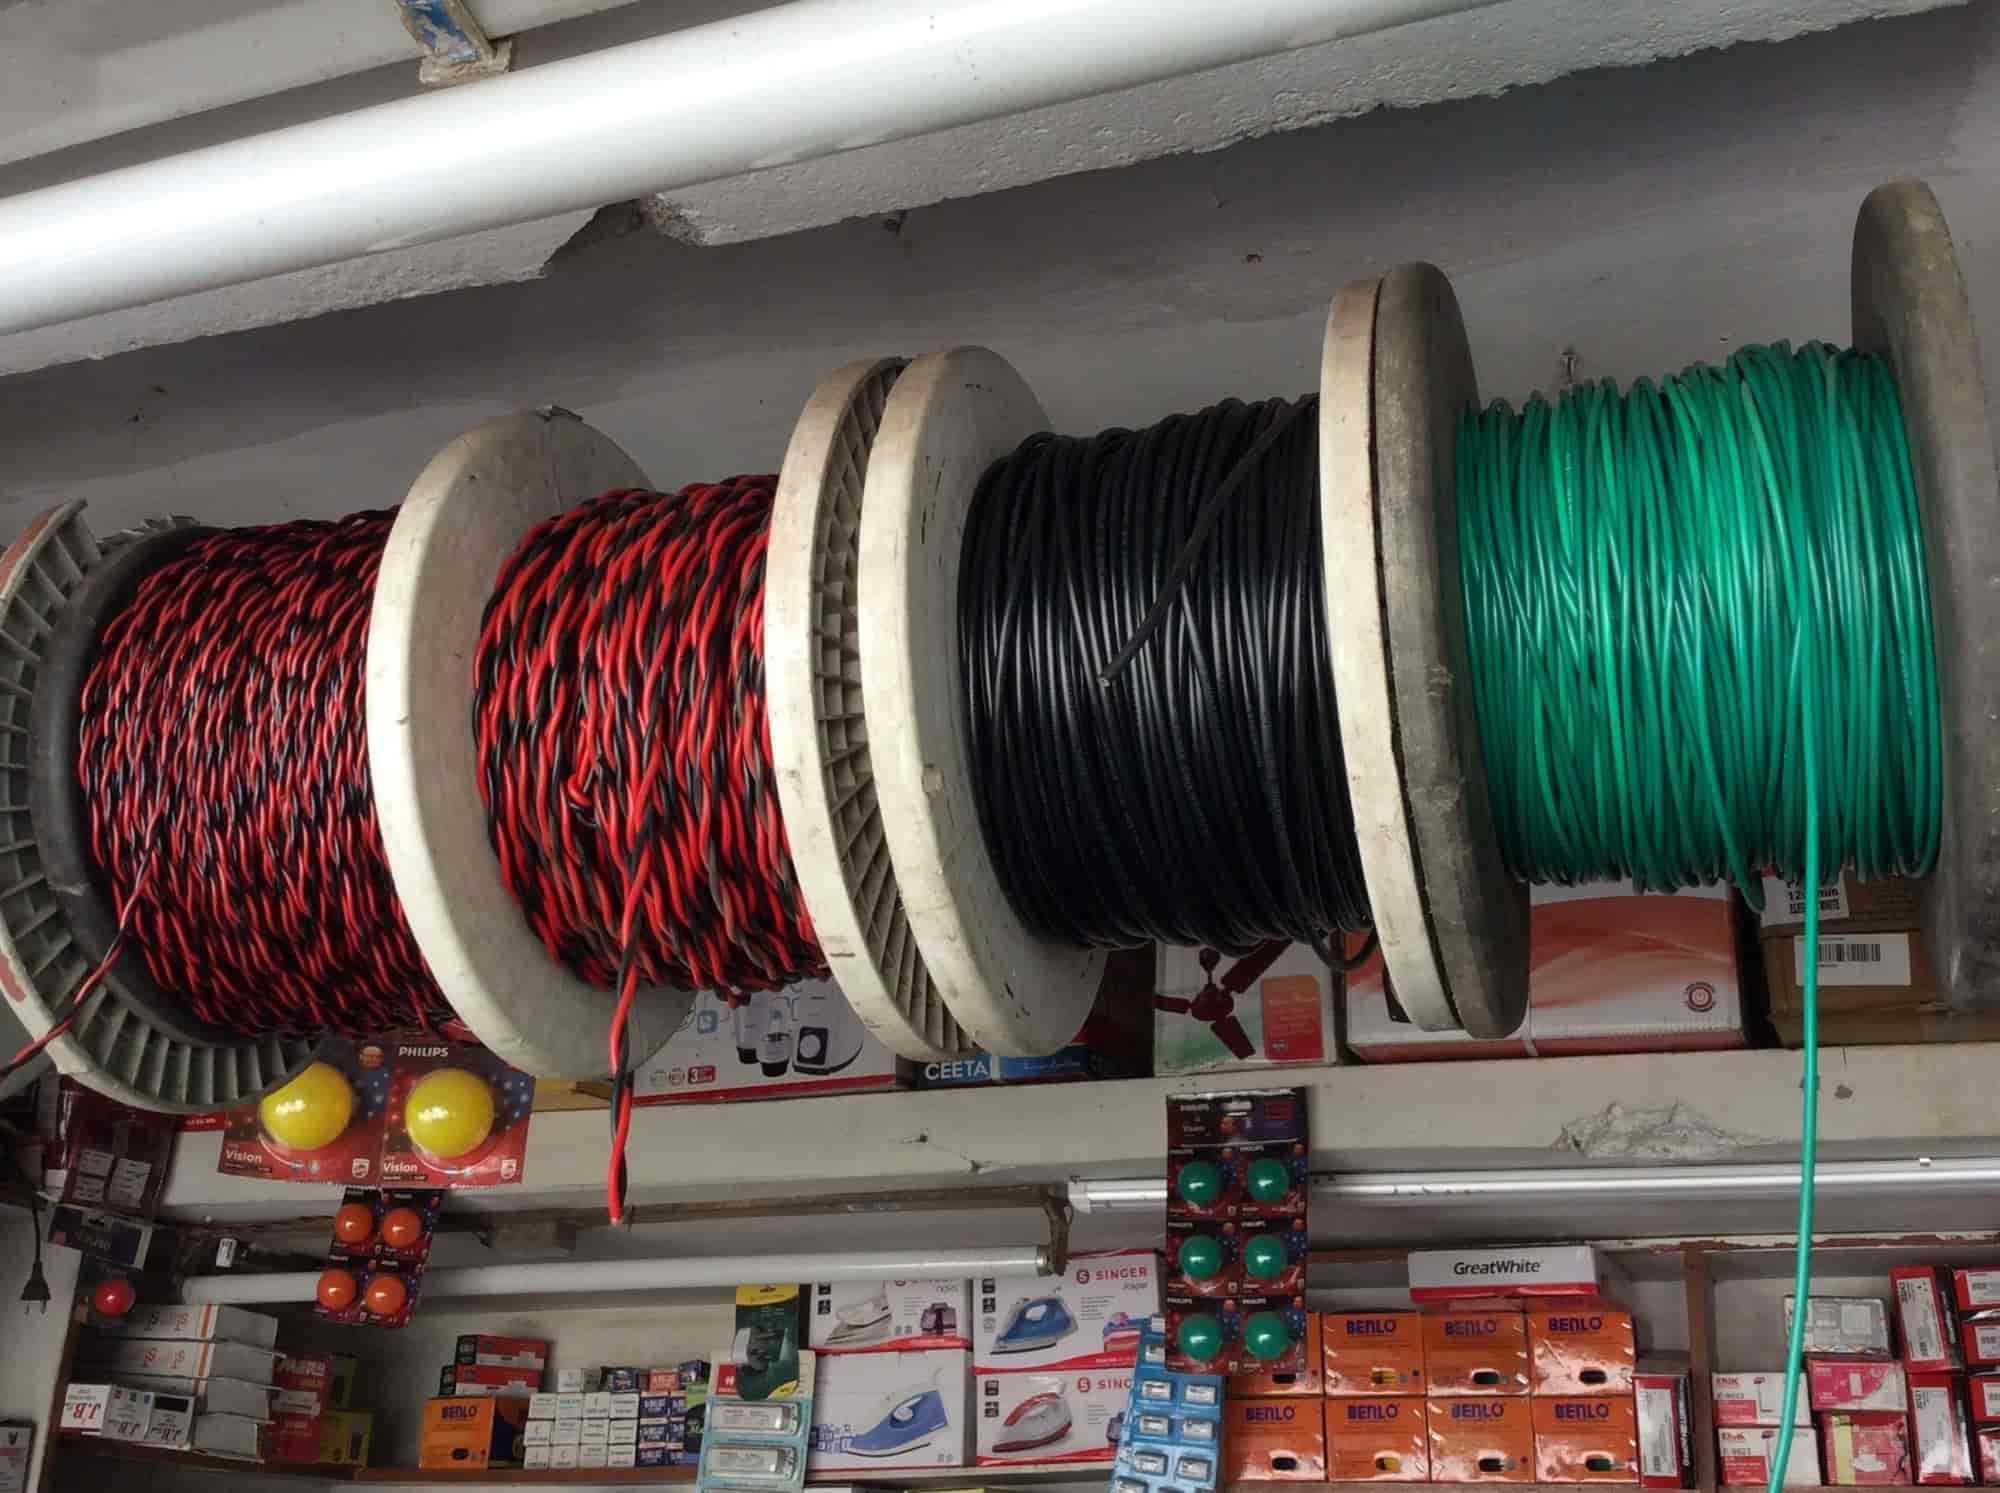 anish electricals photos, tatibandh, raipur-chhattisgarh - home  appliance dealers